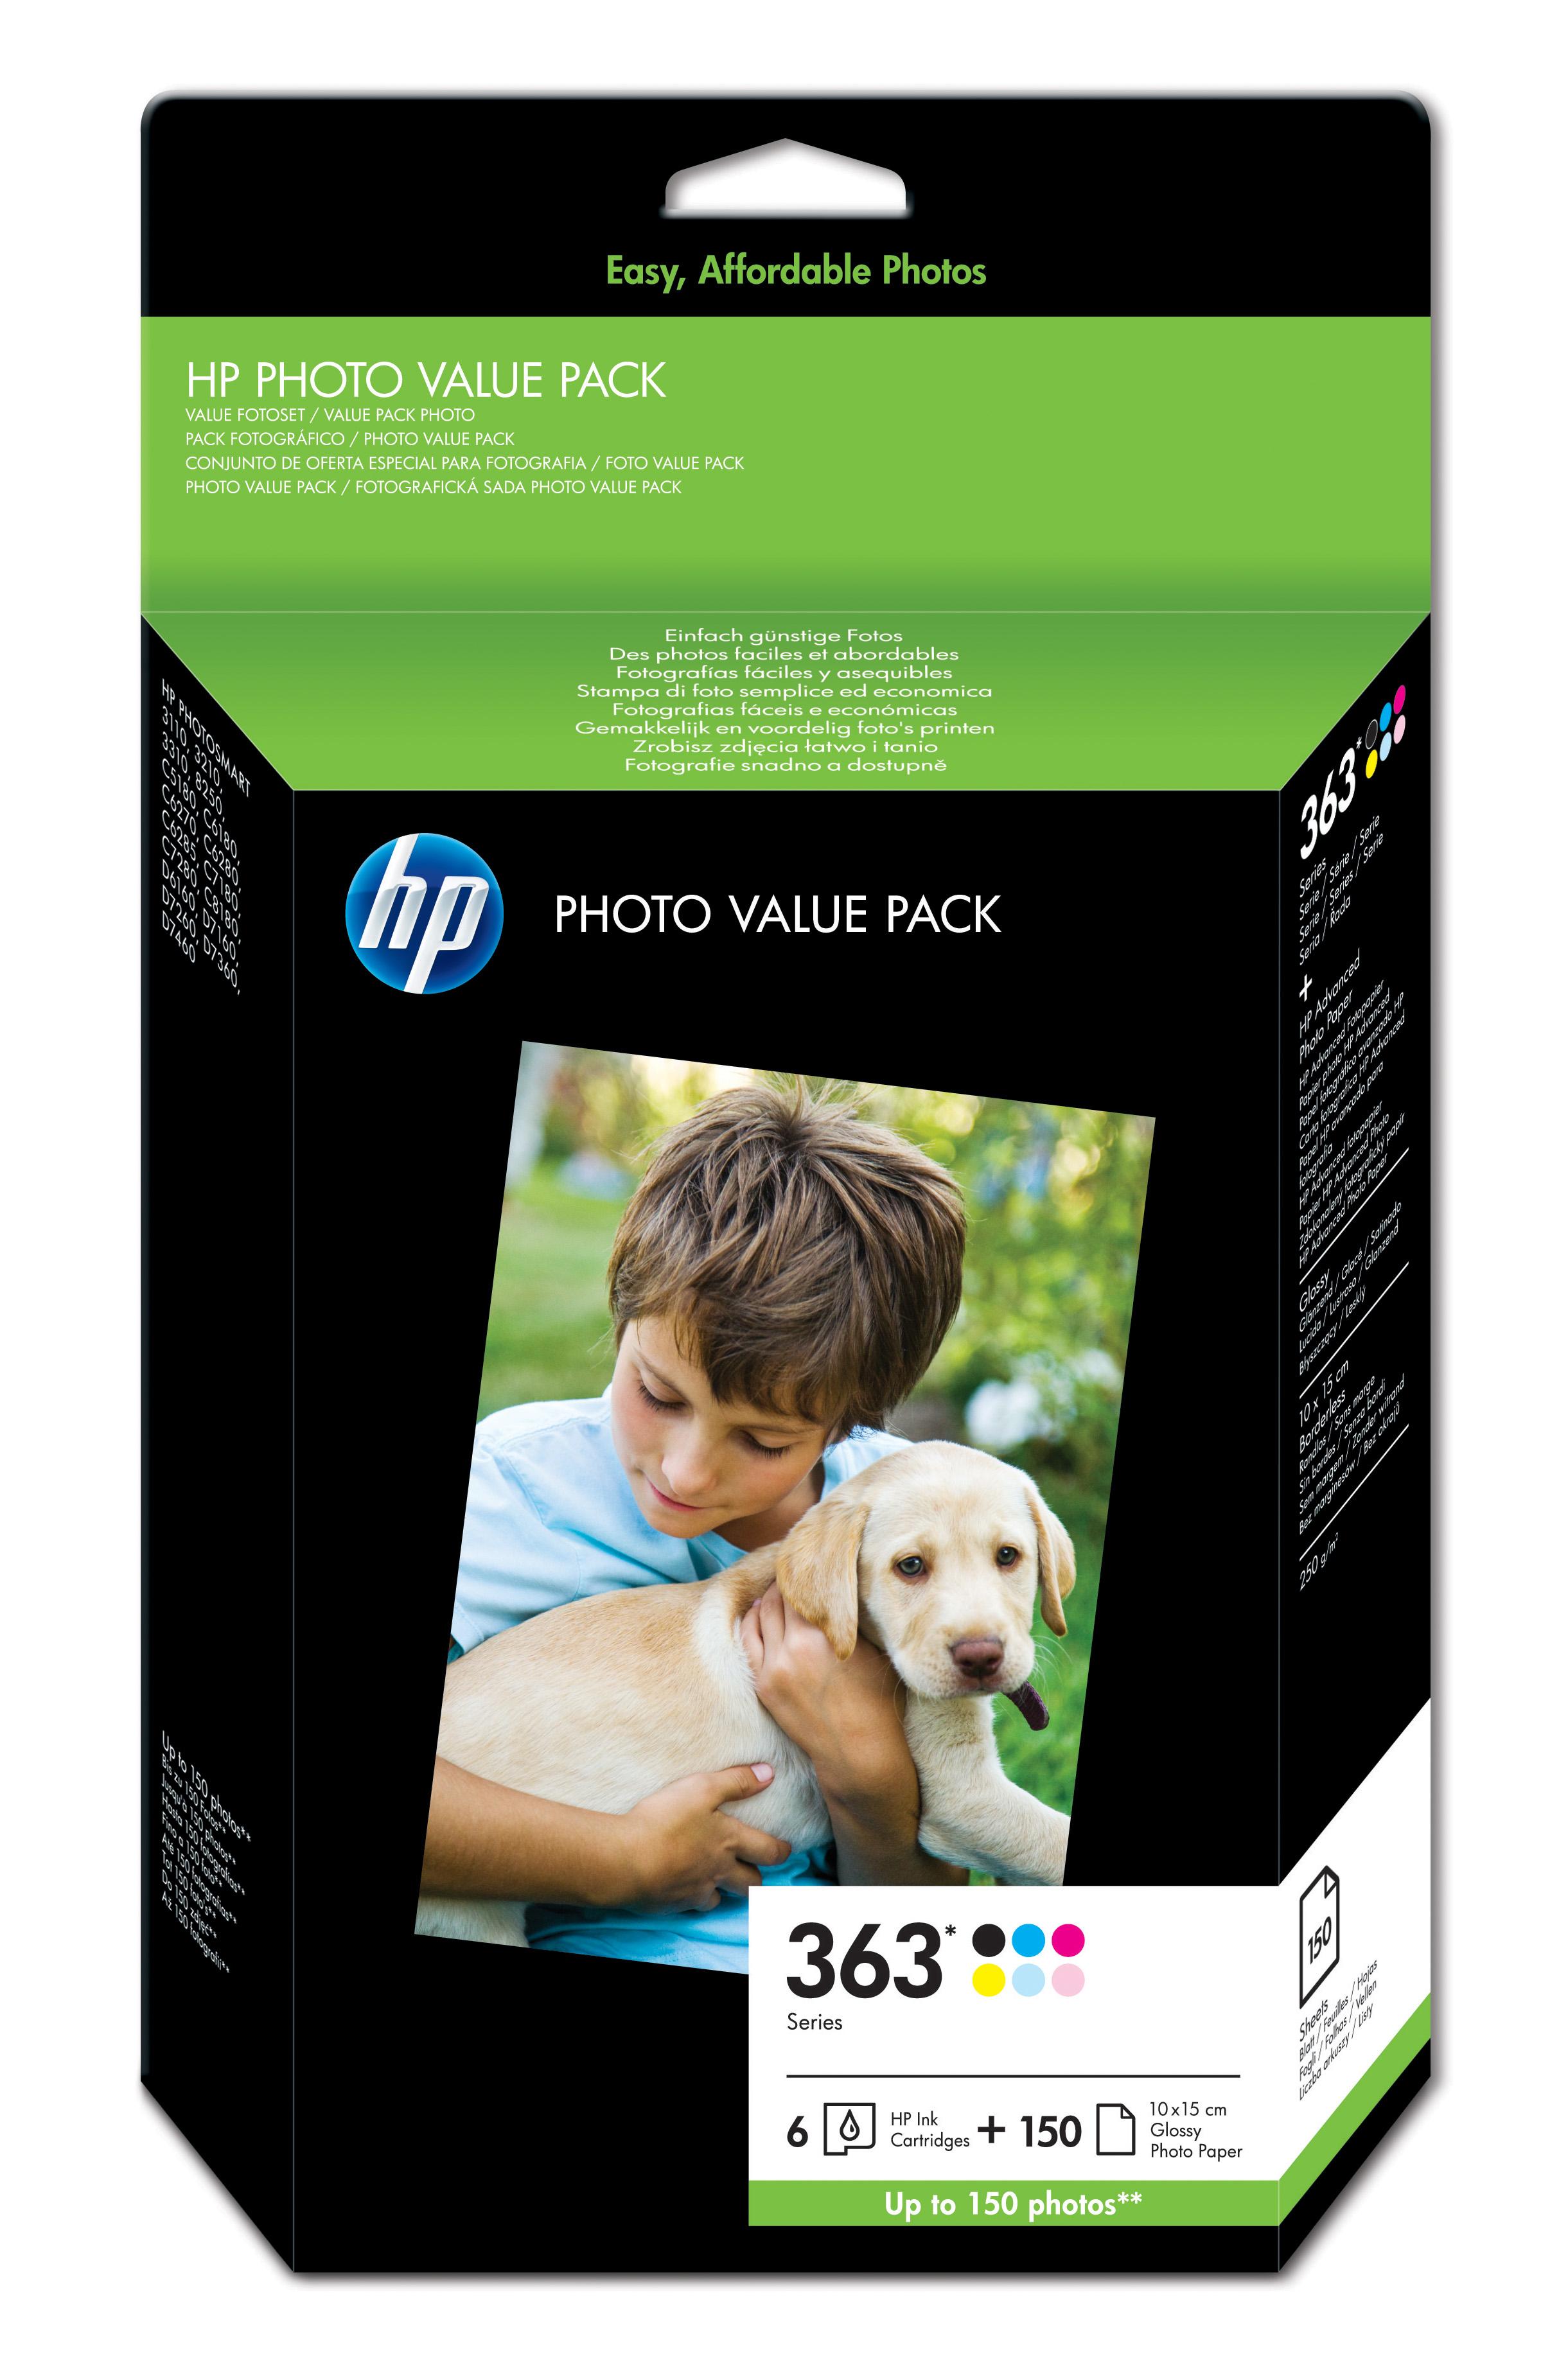 HP 363 Series Photo Value Pack - Schwarz, Gelb, Cyan, Magenta, hell Magenta, hell Cyan